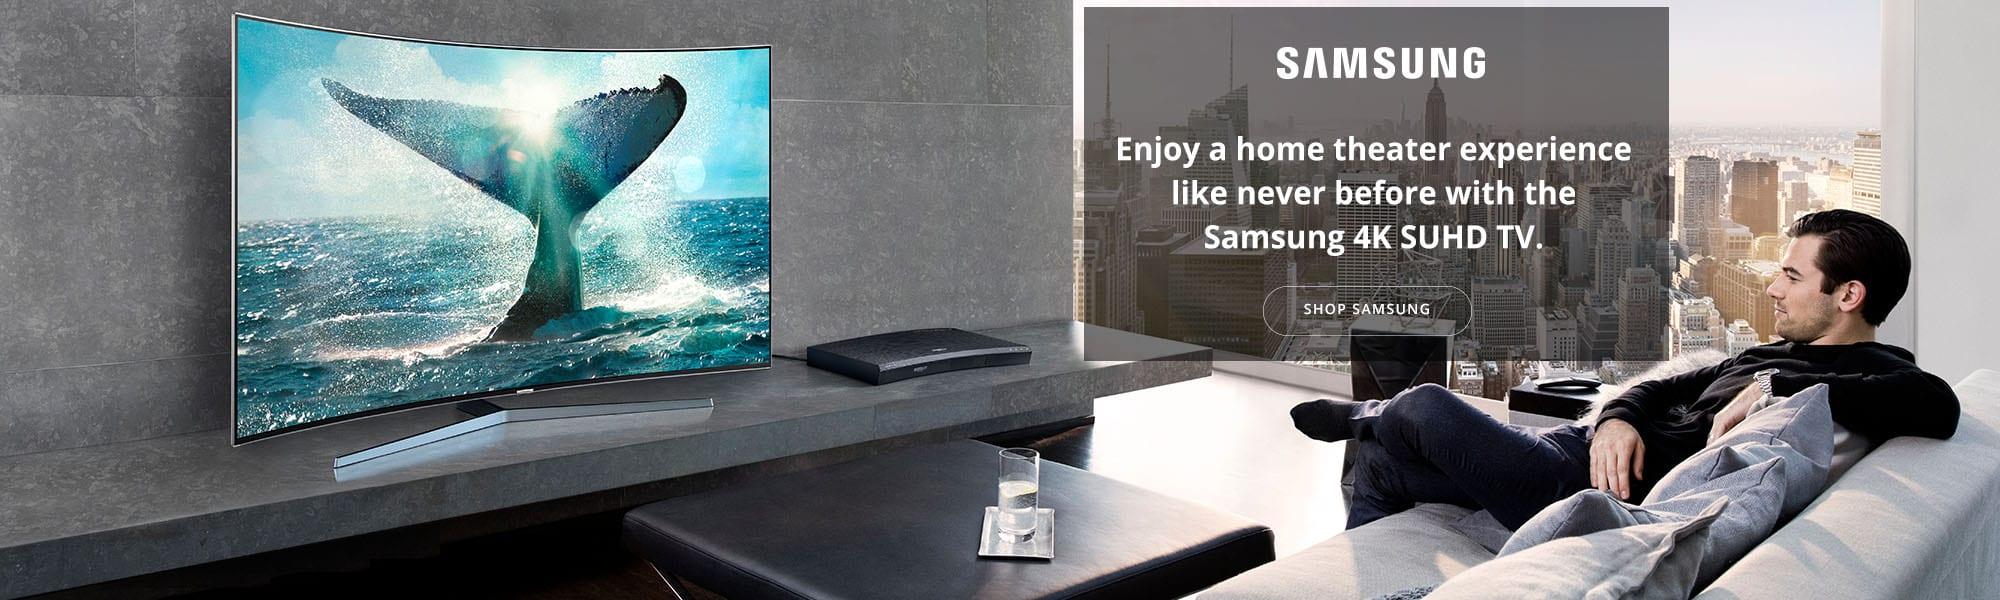 Samsung TV Slide